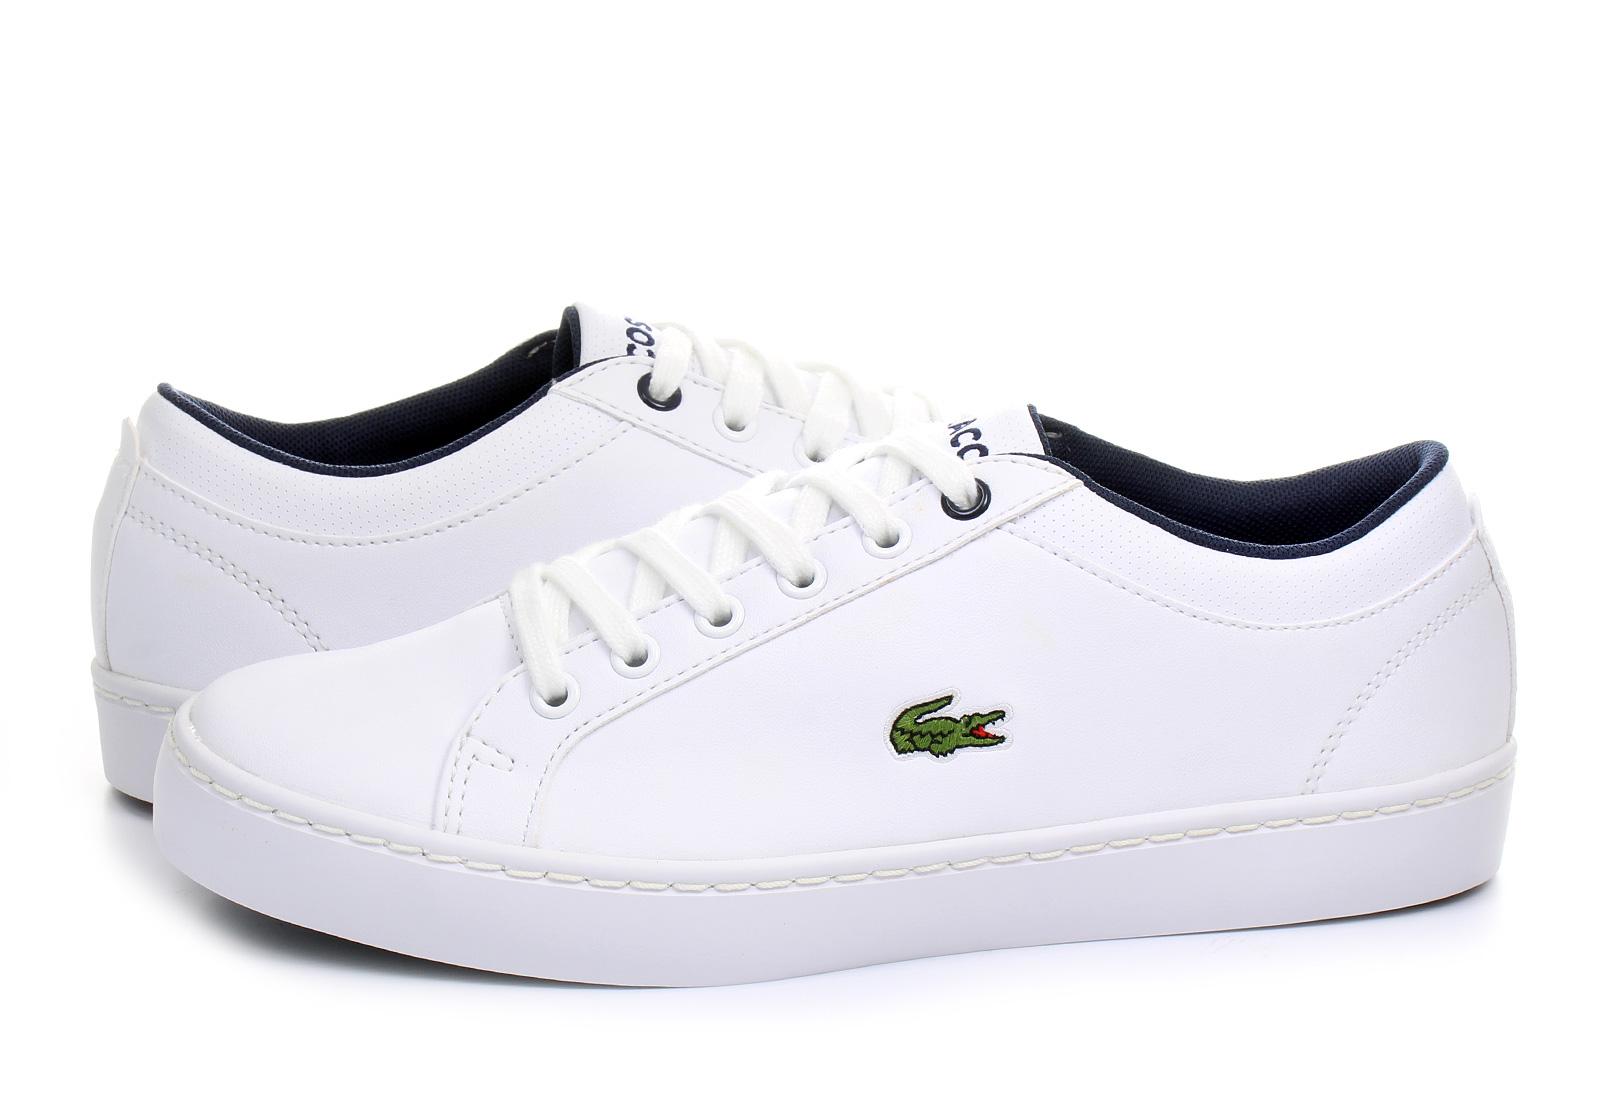 Lacoste Cipő - Straightset Lace - 163spj0126-001 - Office Shoes ... 605772f383